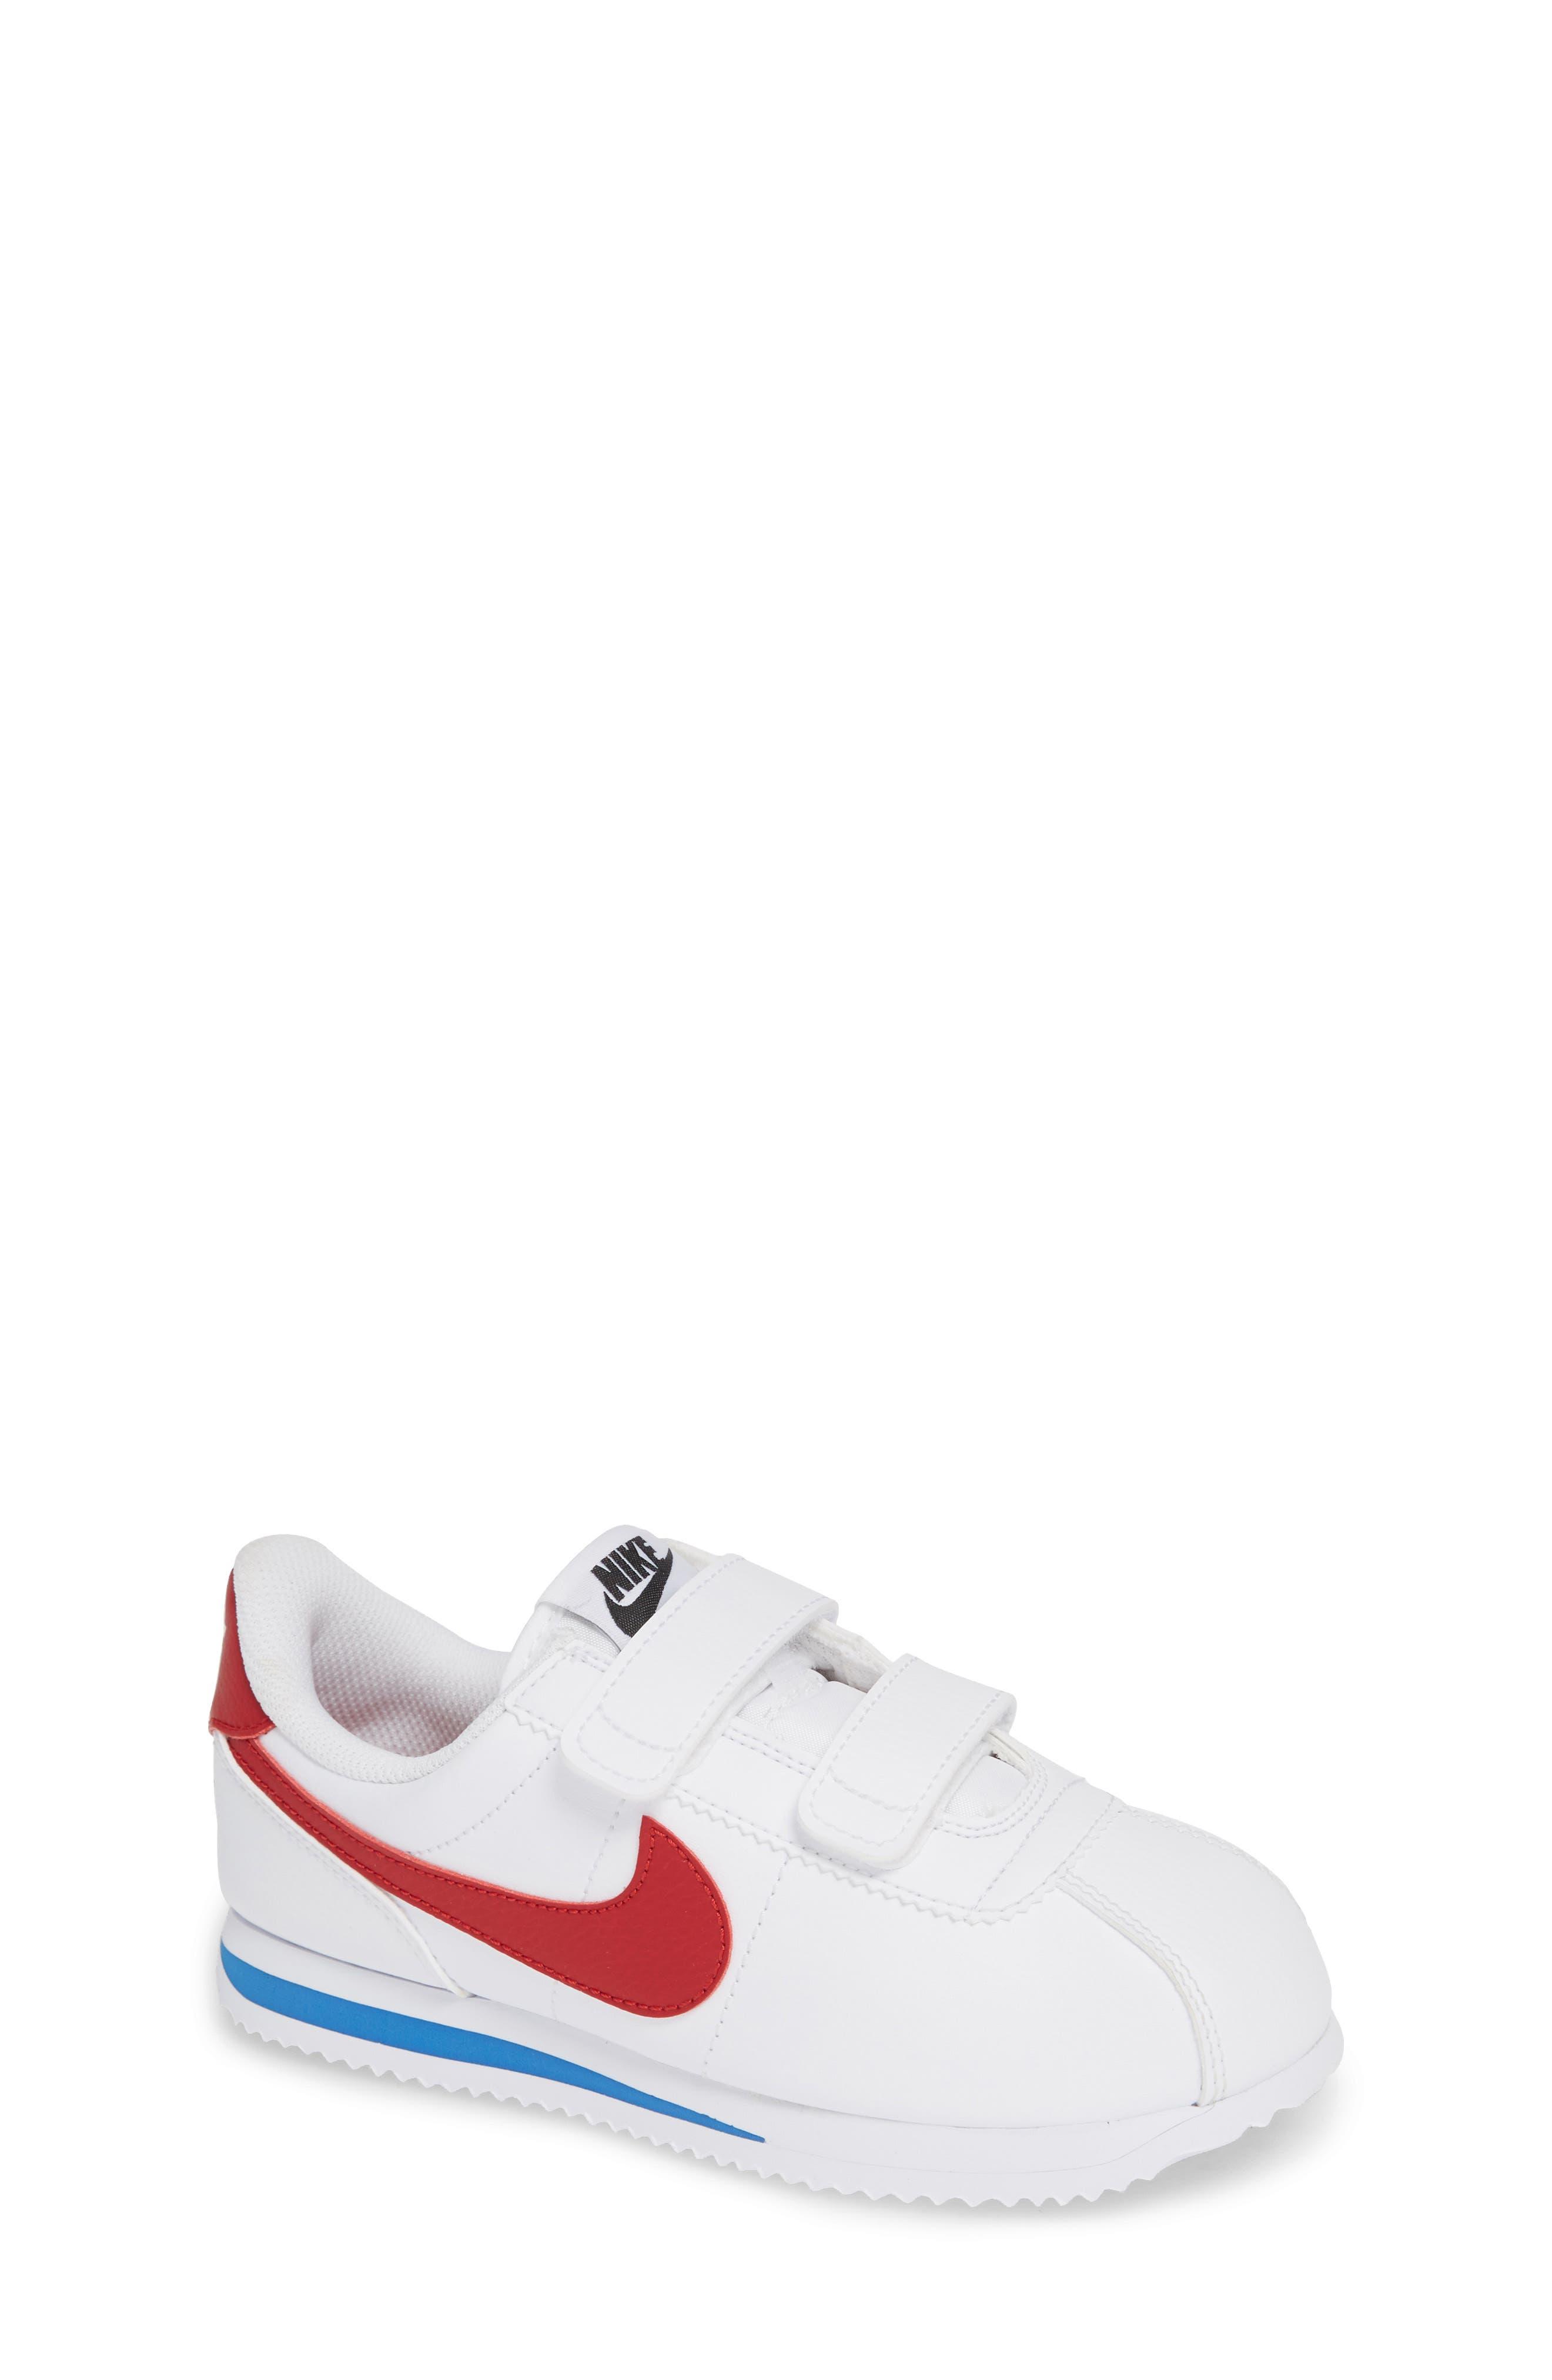 NIKE, Cortez Basic SL Sneaker, Main thumbnail 1, color, WHITE/ VARSITY RED/ BLACK